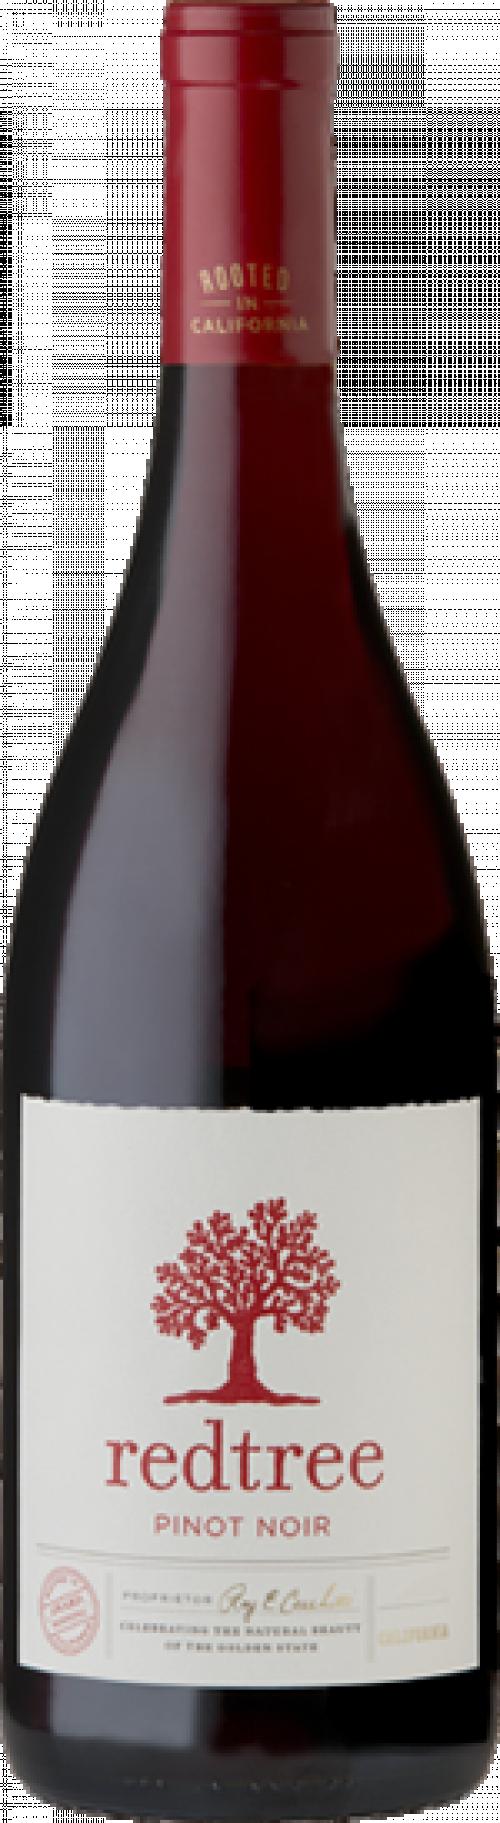 2015 Redtree Pinot Noir 750ml